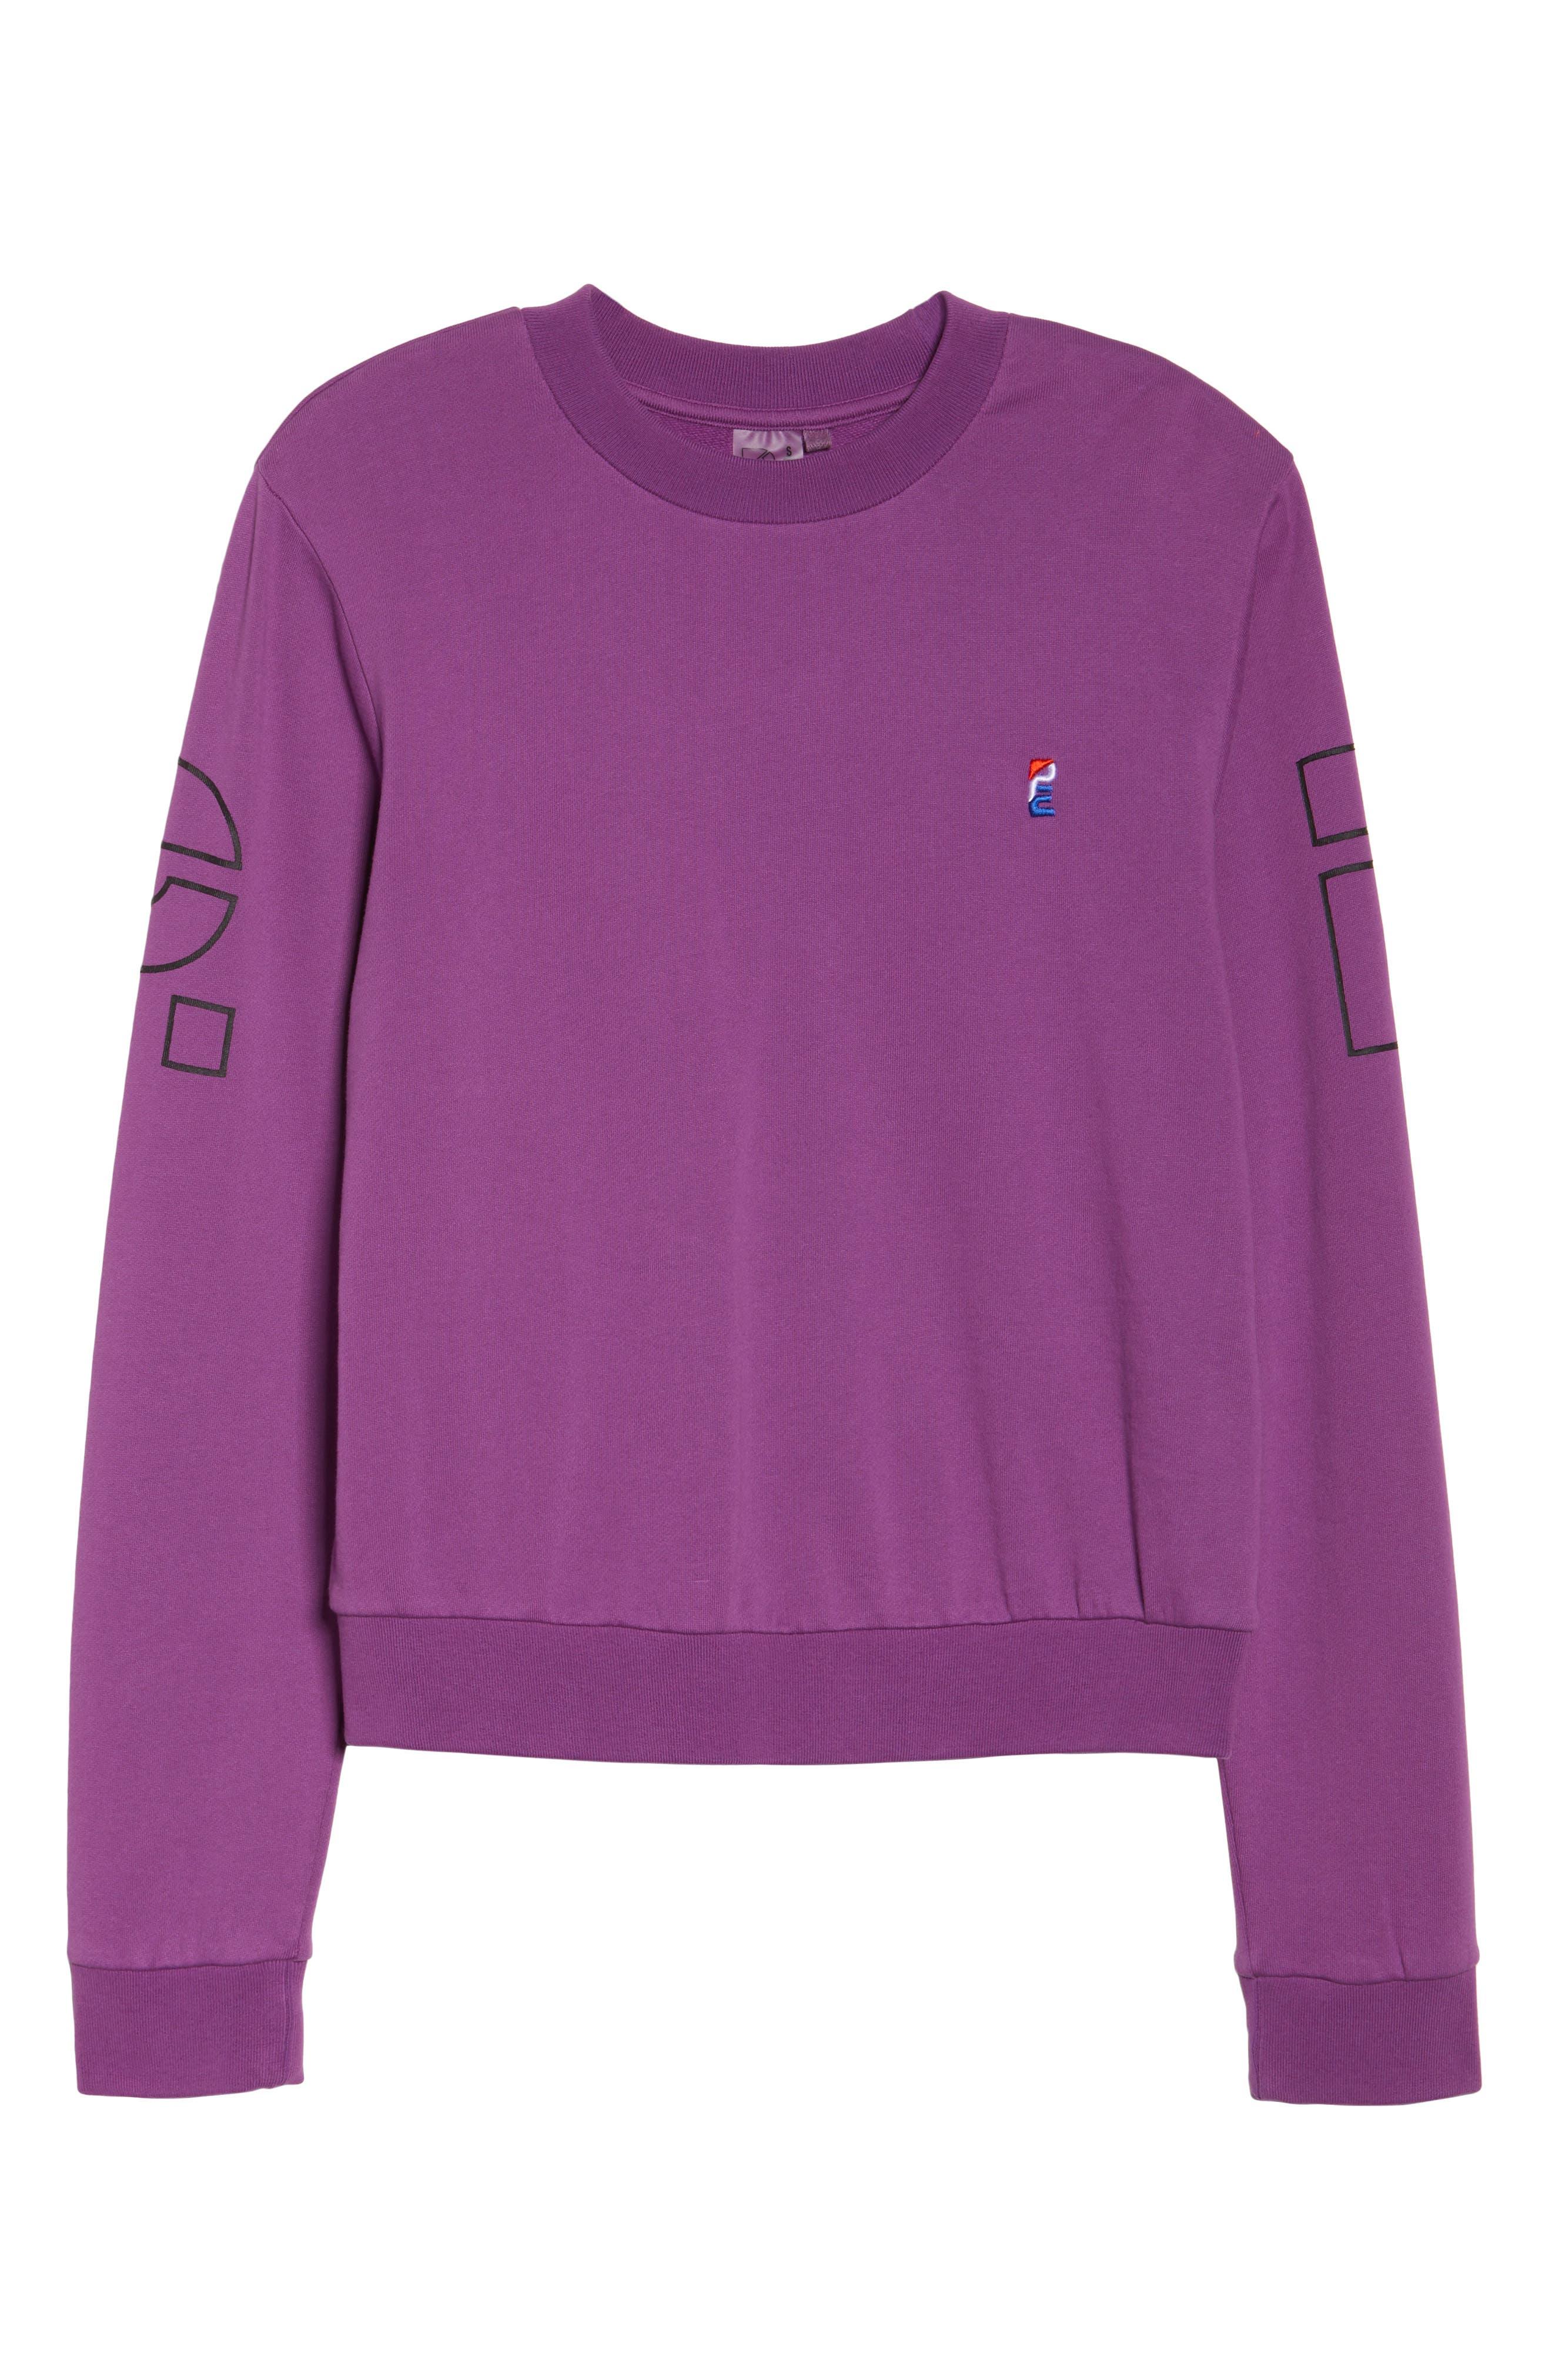 Moneyball Sweatshirt,                             Alternate thumbnail 7, color,                             500